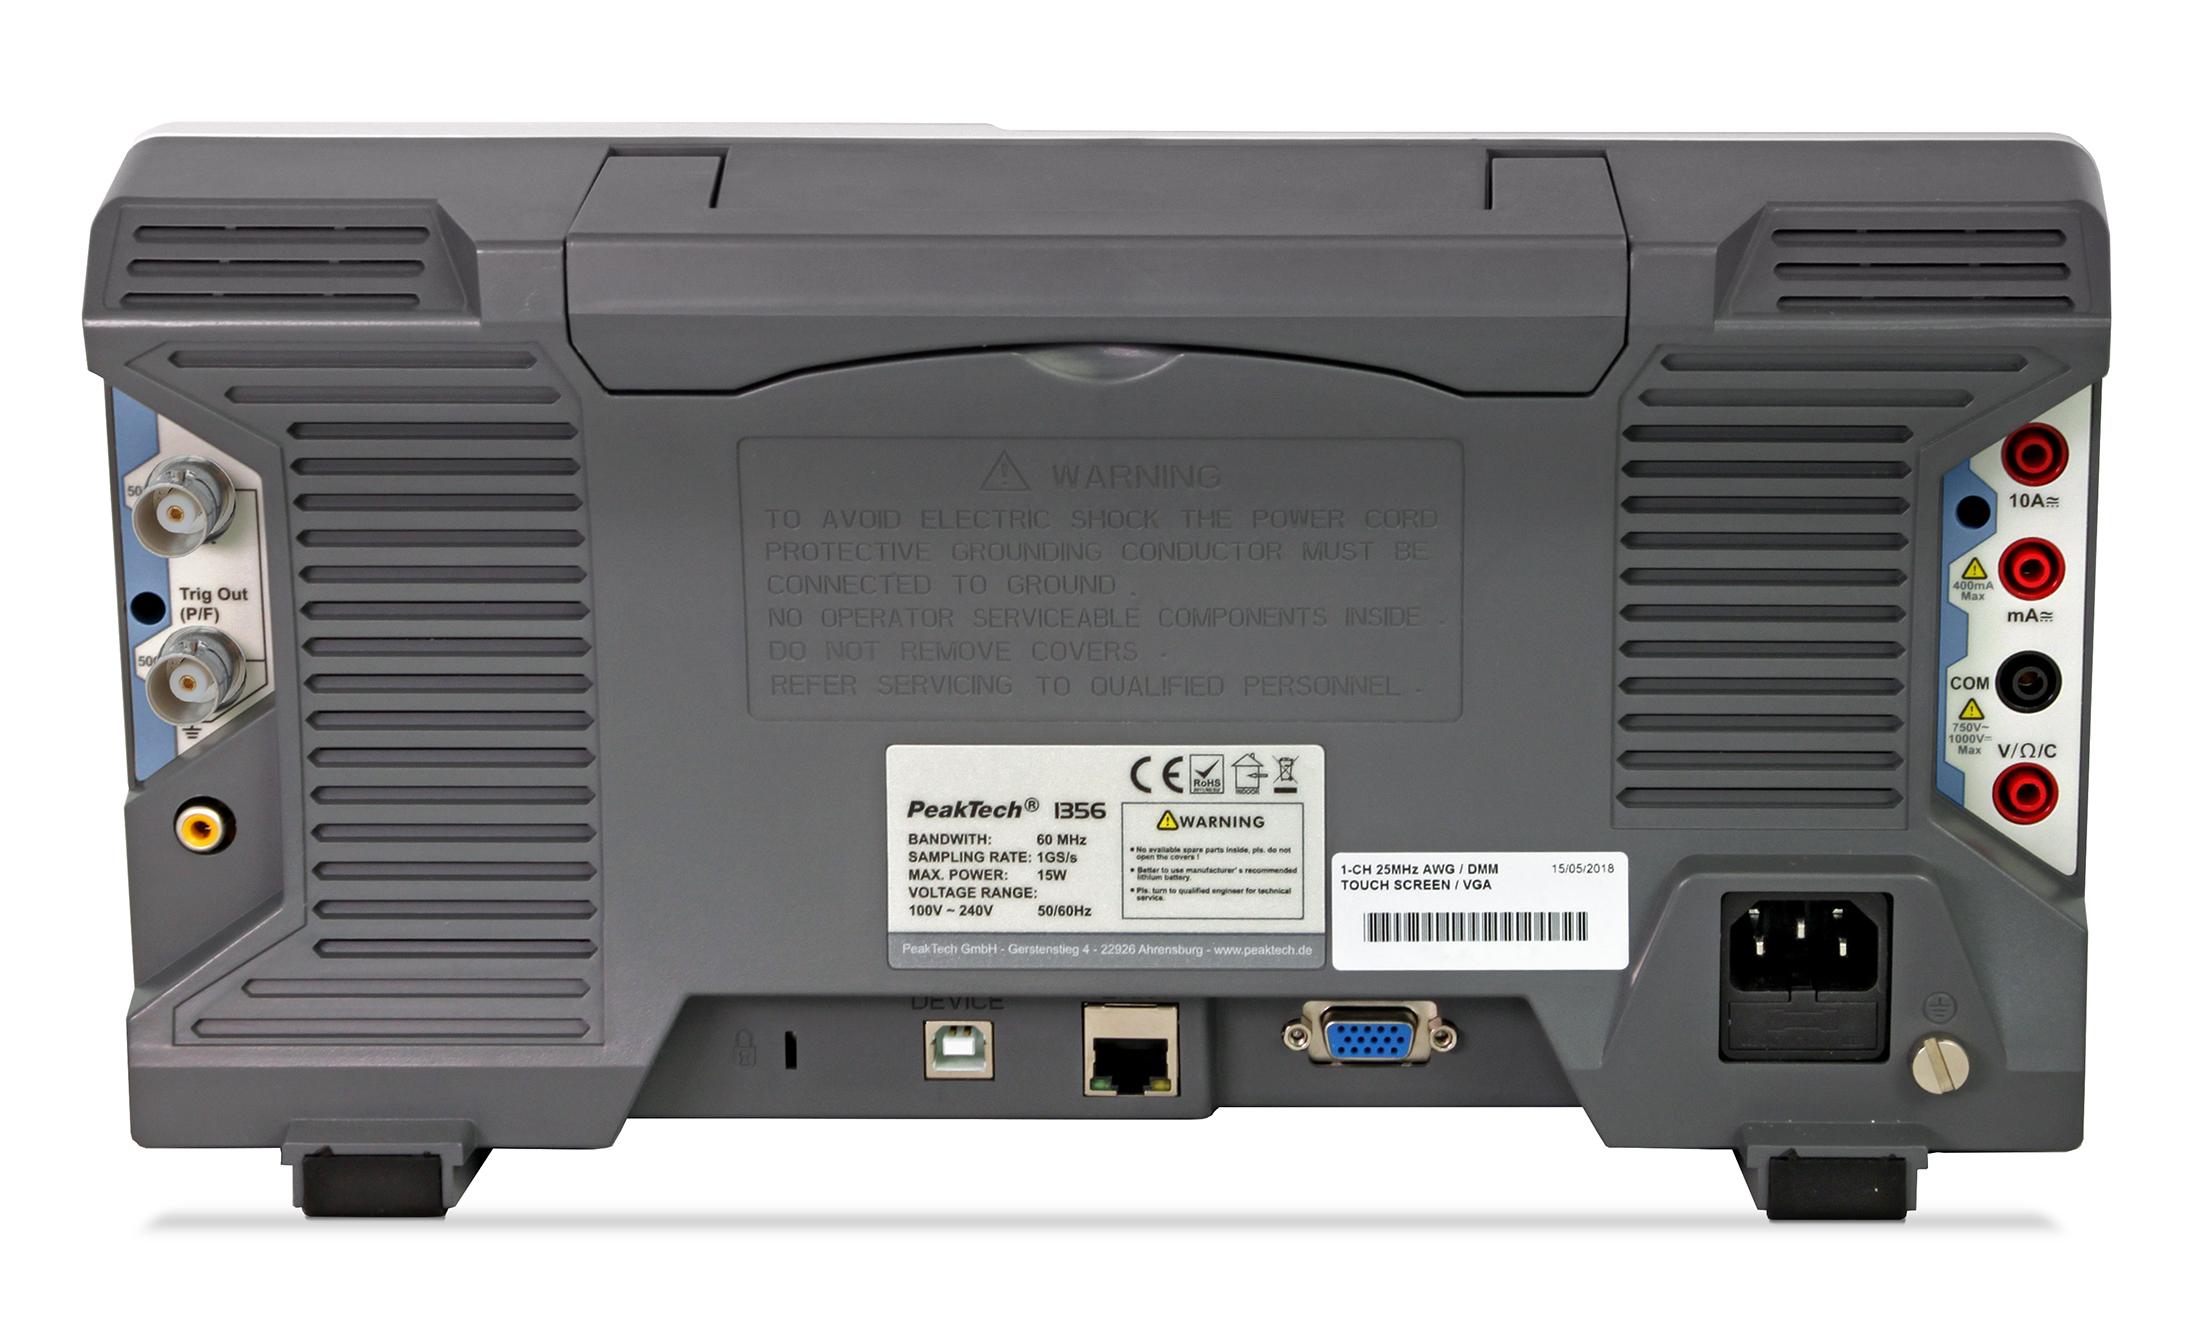 «PeakTech® P 1362» 200 MHz / 2 CH, 2 GS/s touchscreen oscilloscope